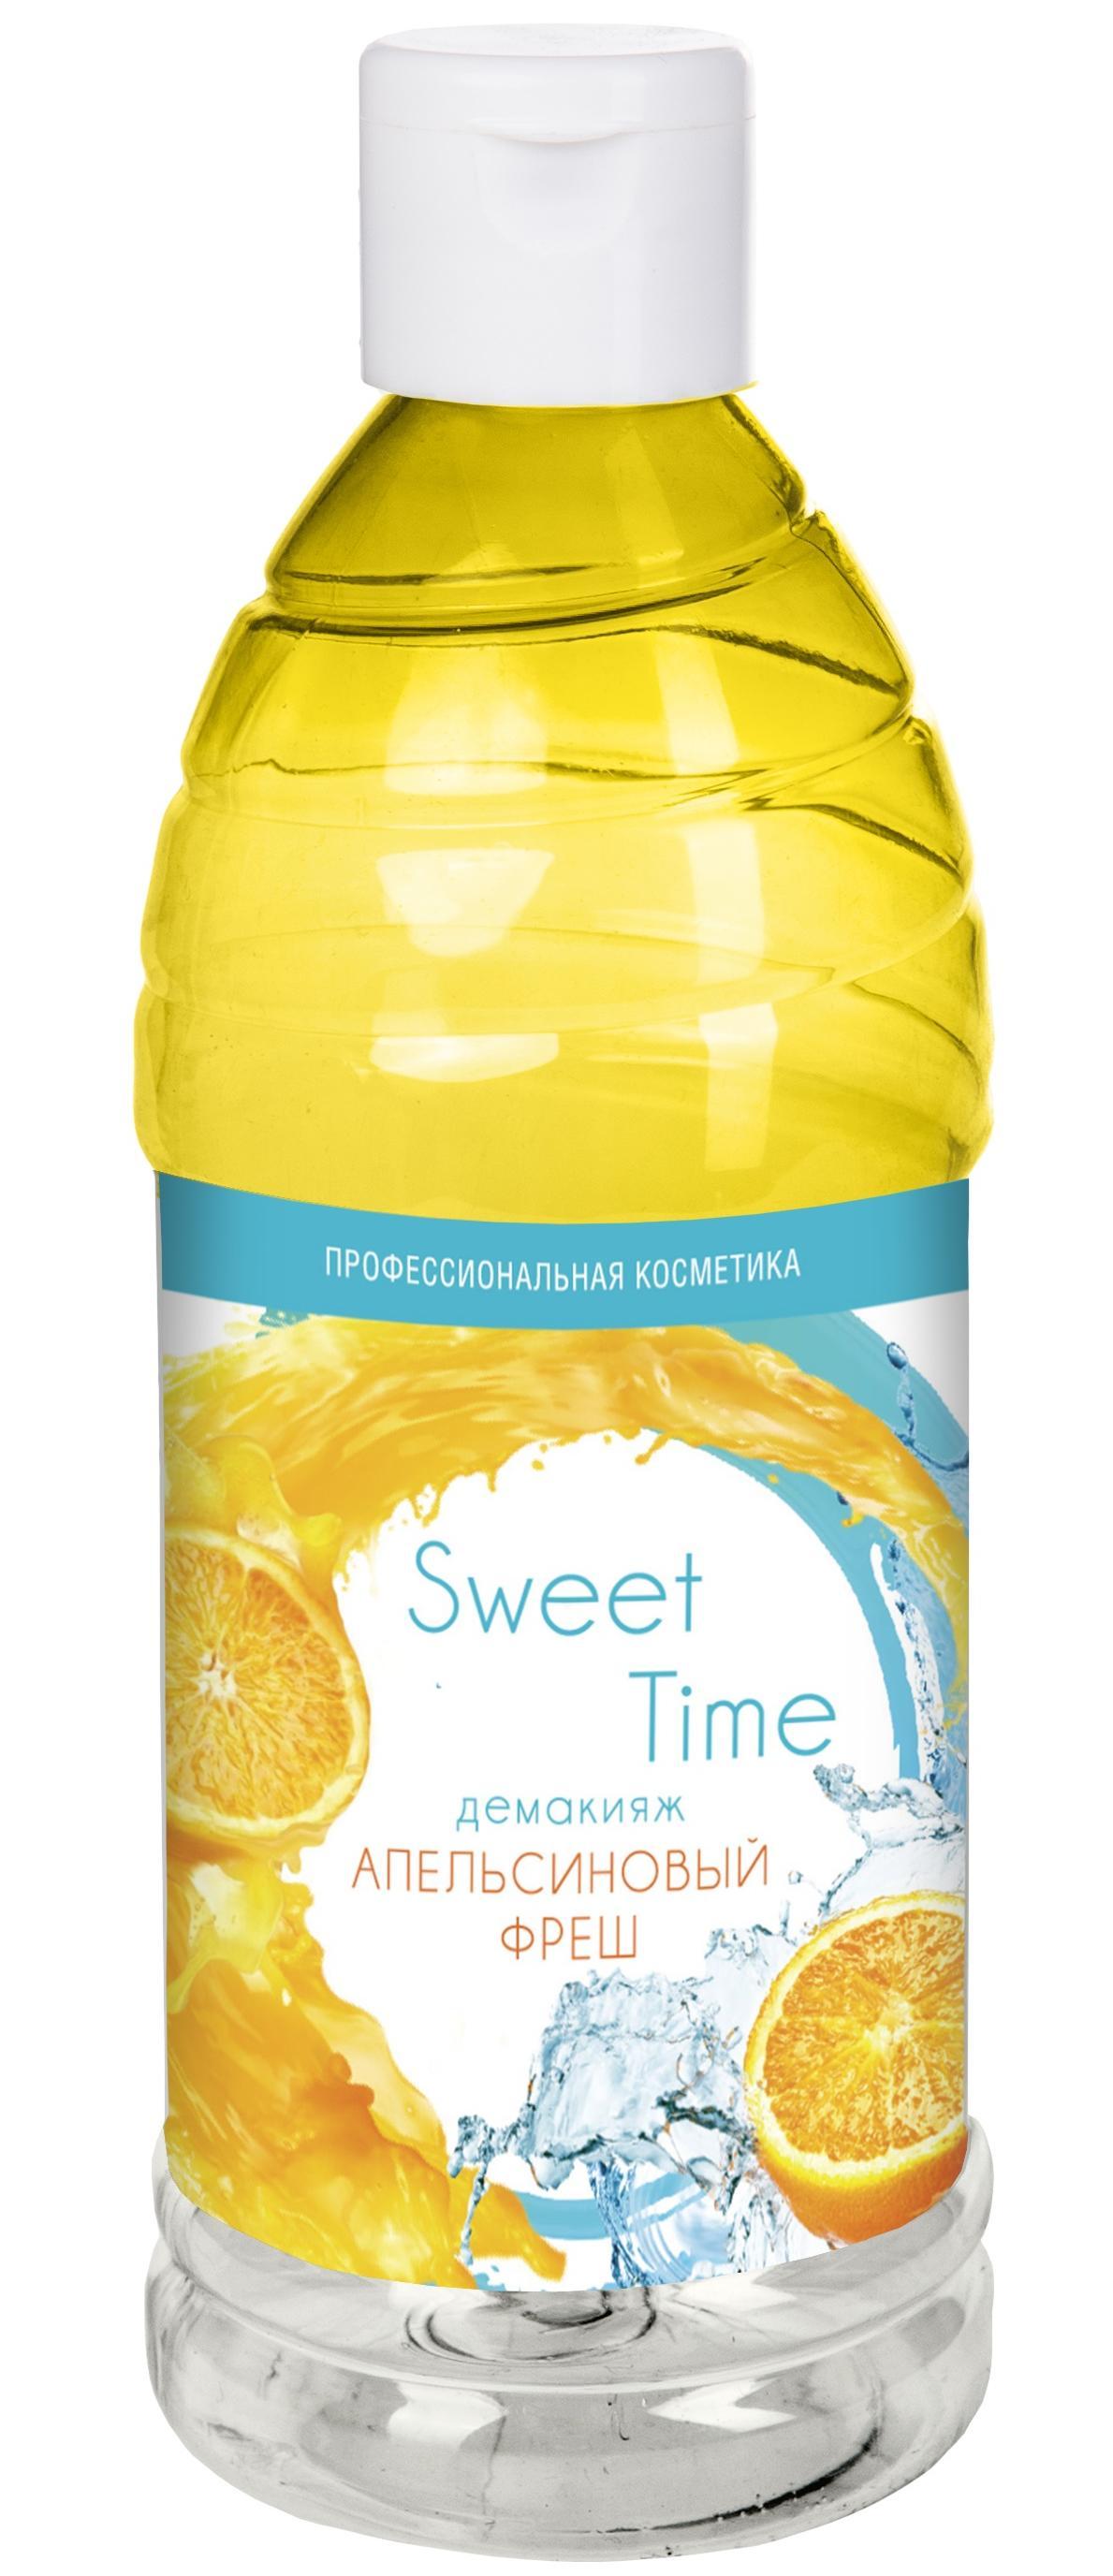 DOMIX Демакияж Апельсиновый фреш / Sweet Time 210 мл